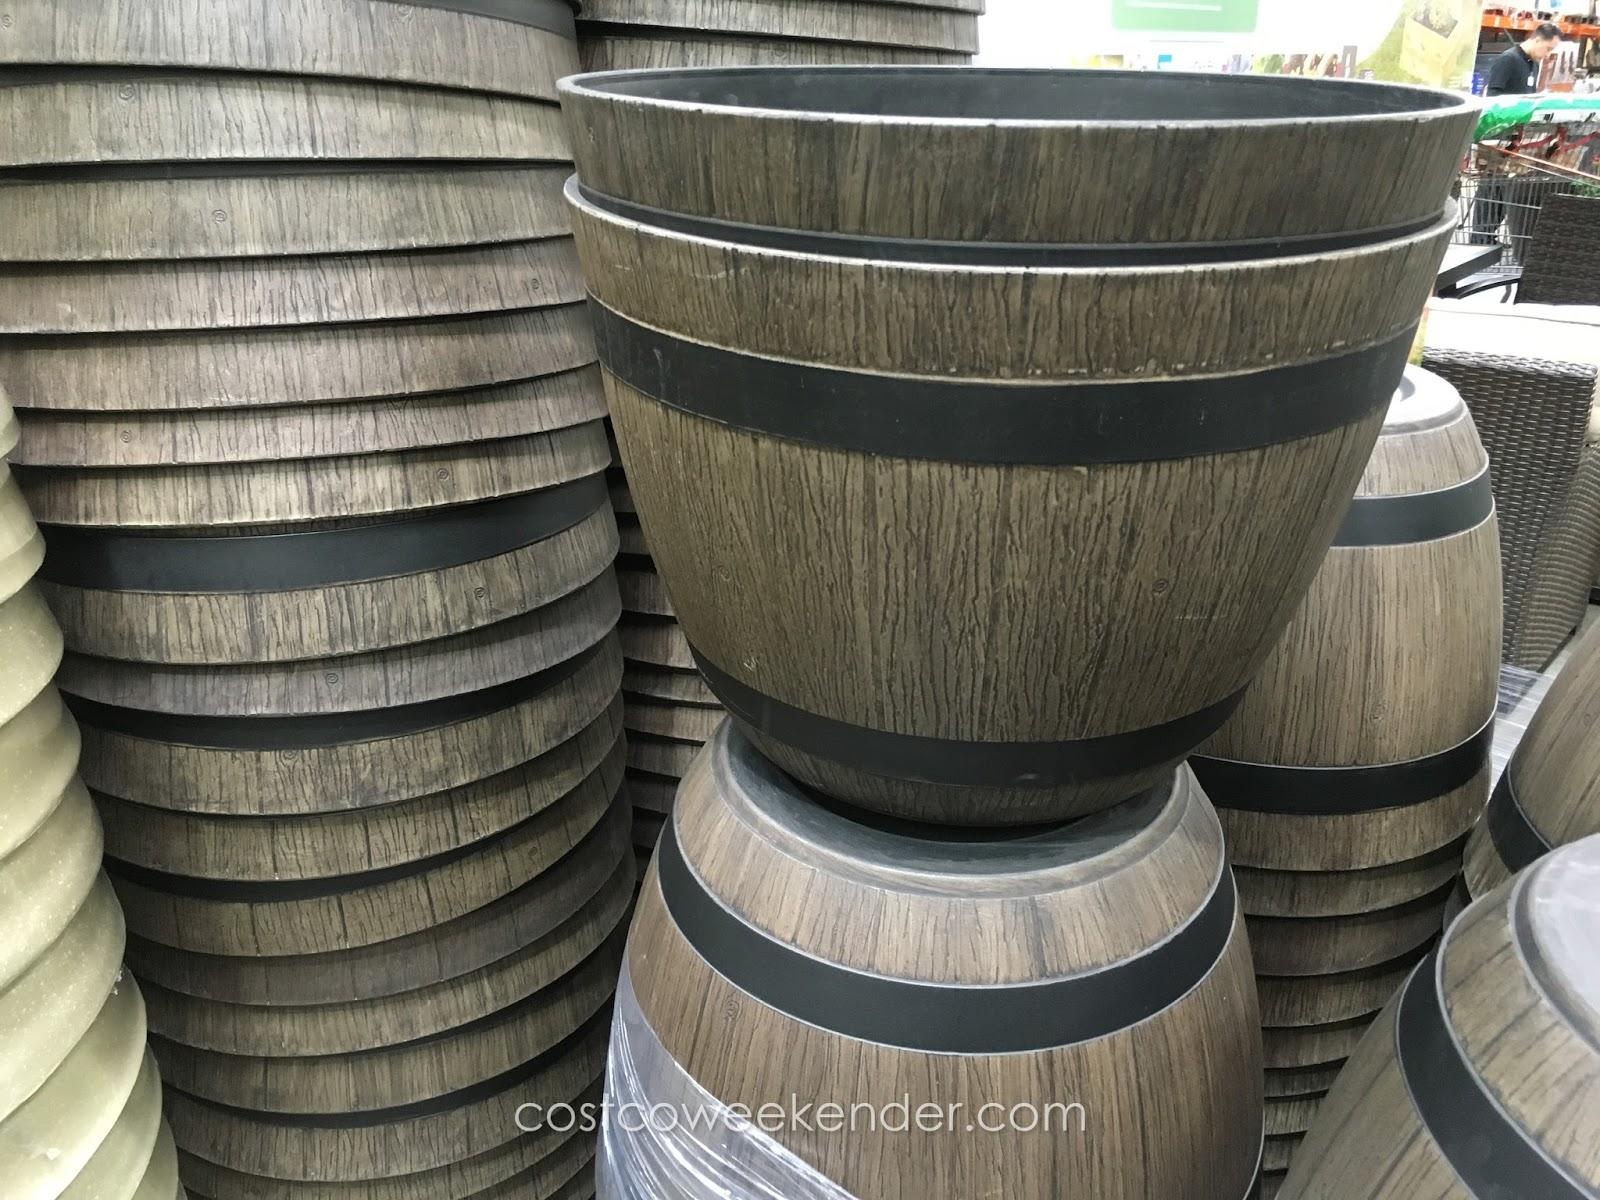 wine barrel planter high density resin   costco weekender